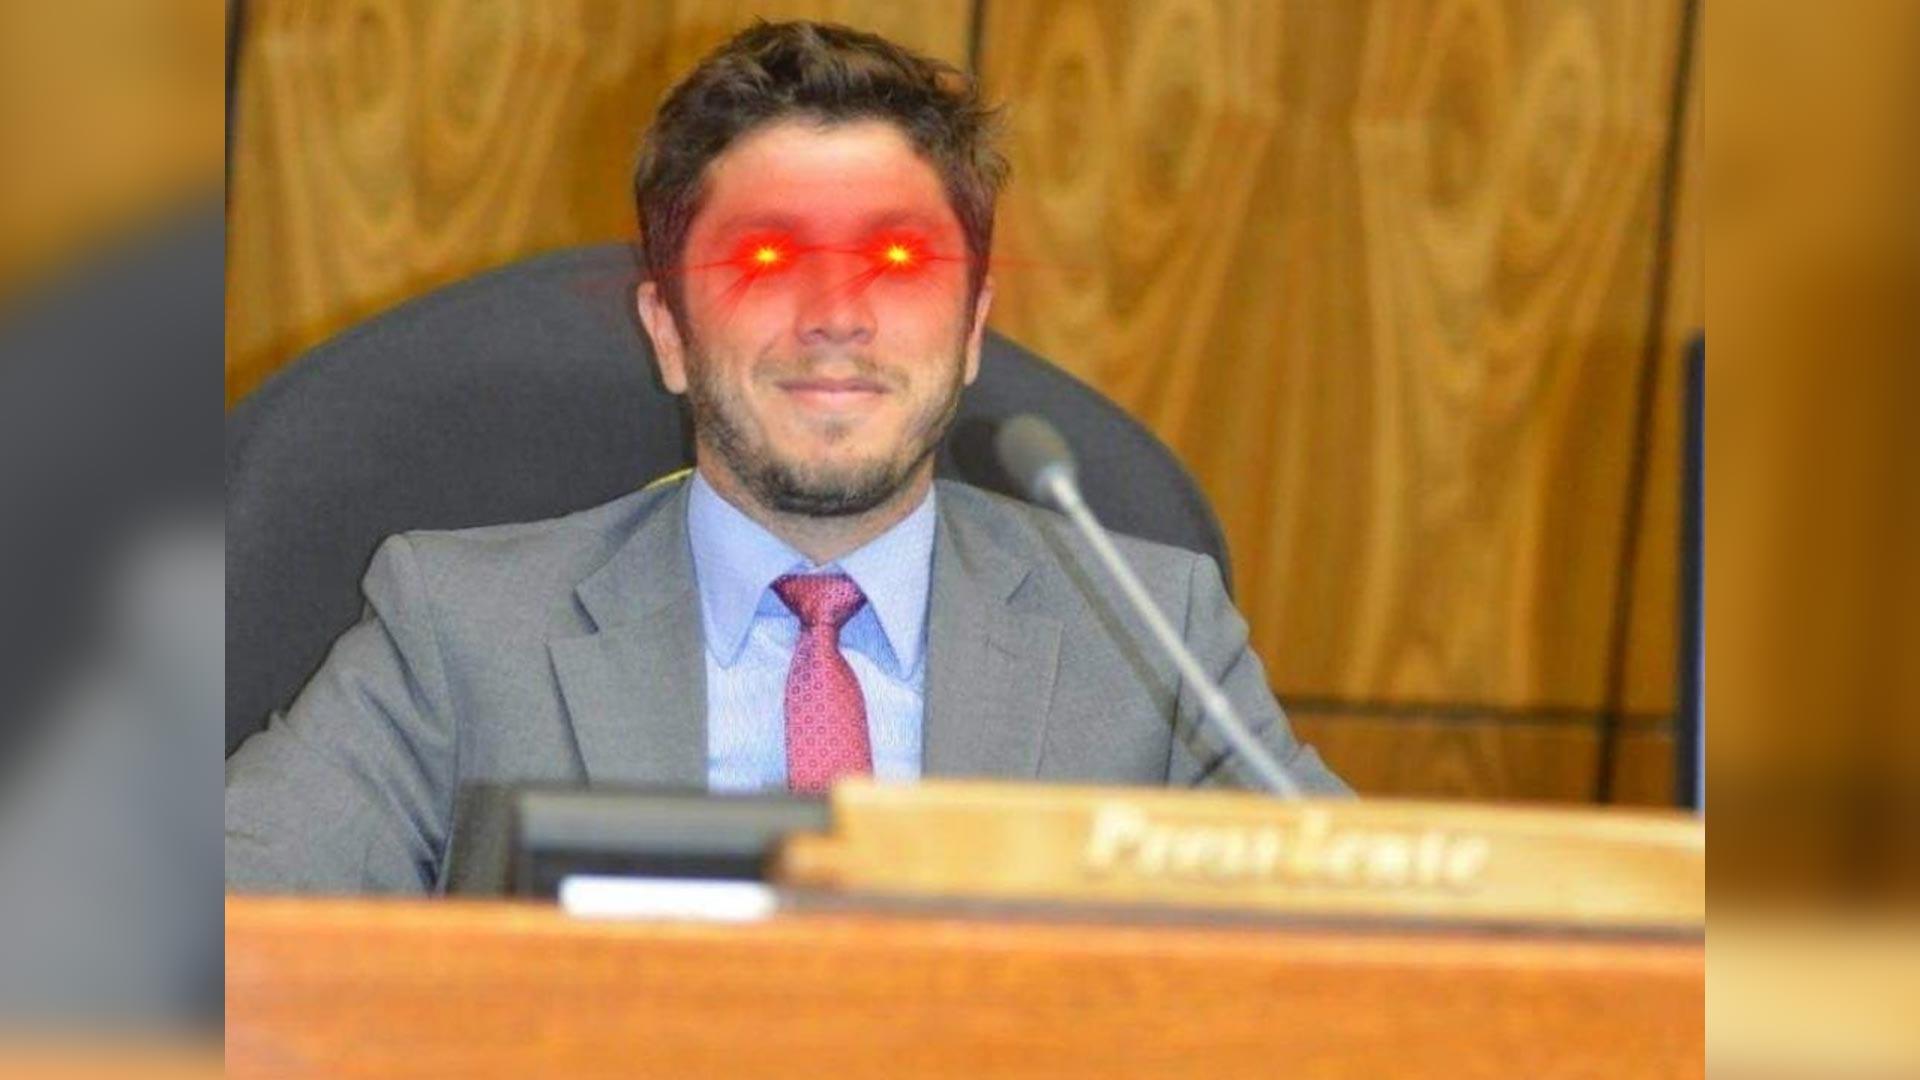 Deputado paraguaio diz que vai tornar bitcoin moeda legal se for eleito presidente